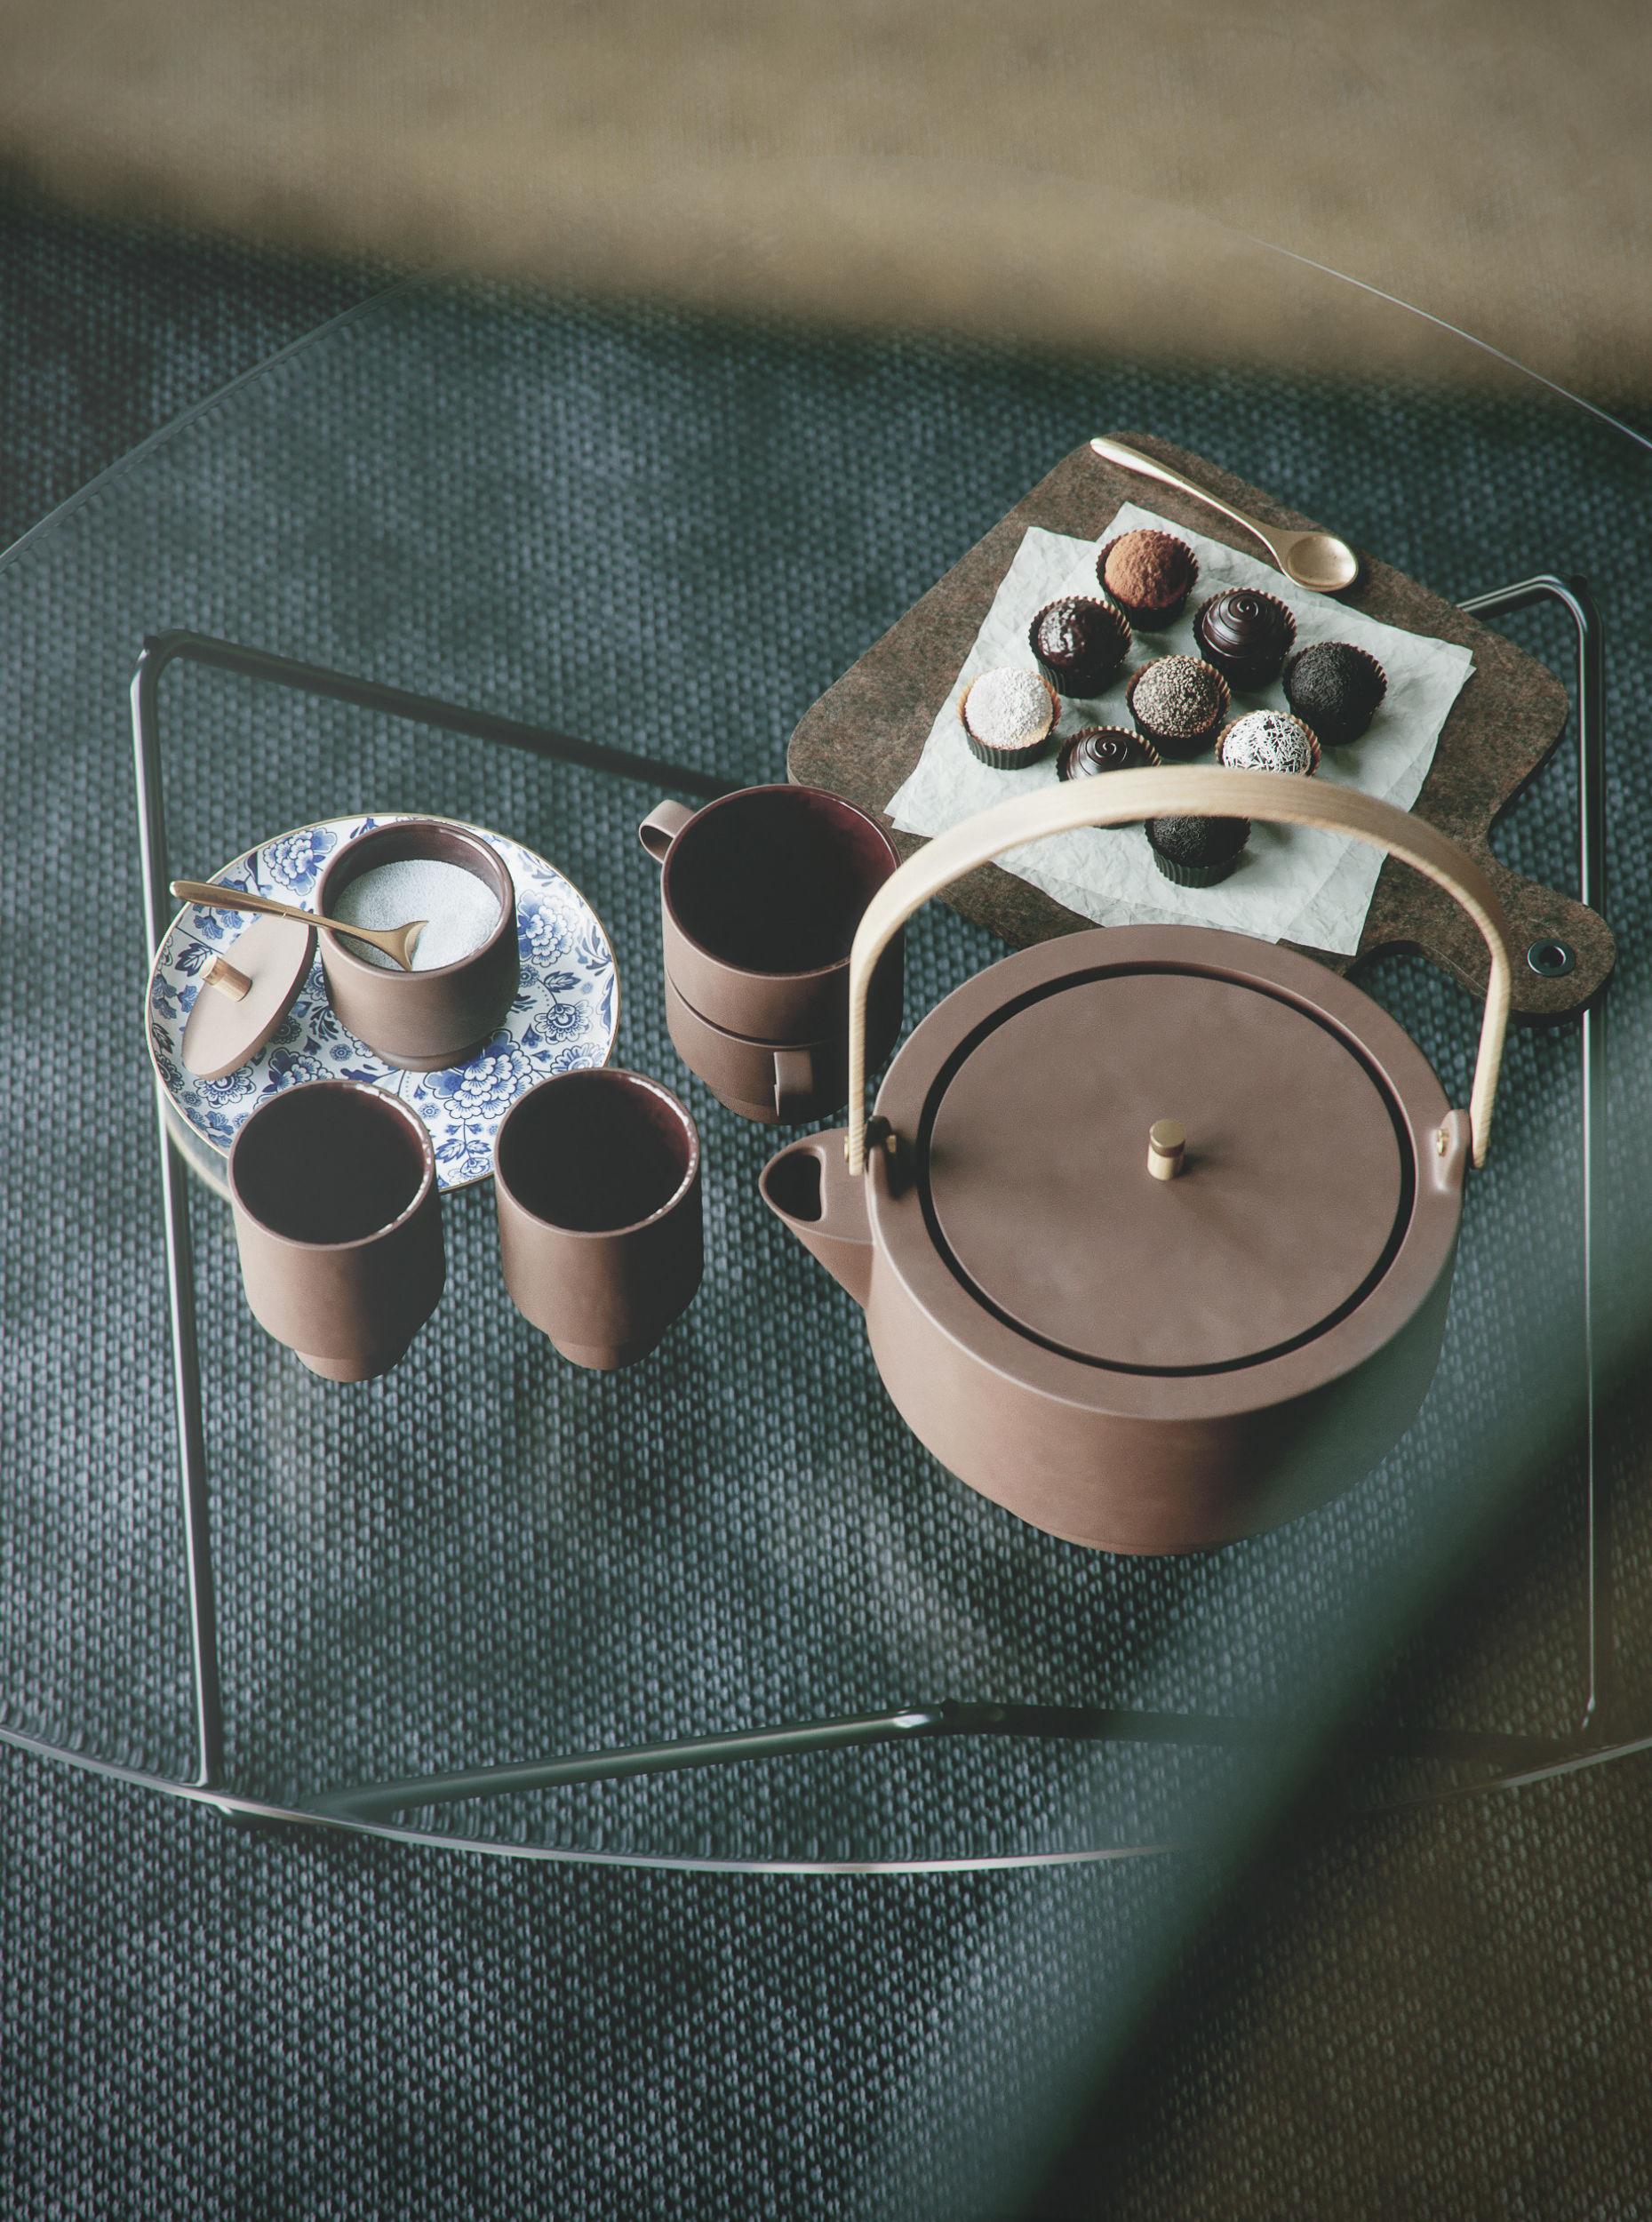 Tea and Chocolate interior scene